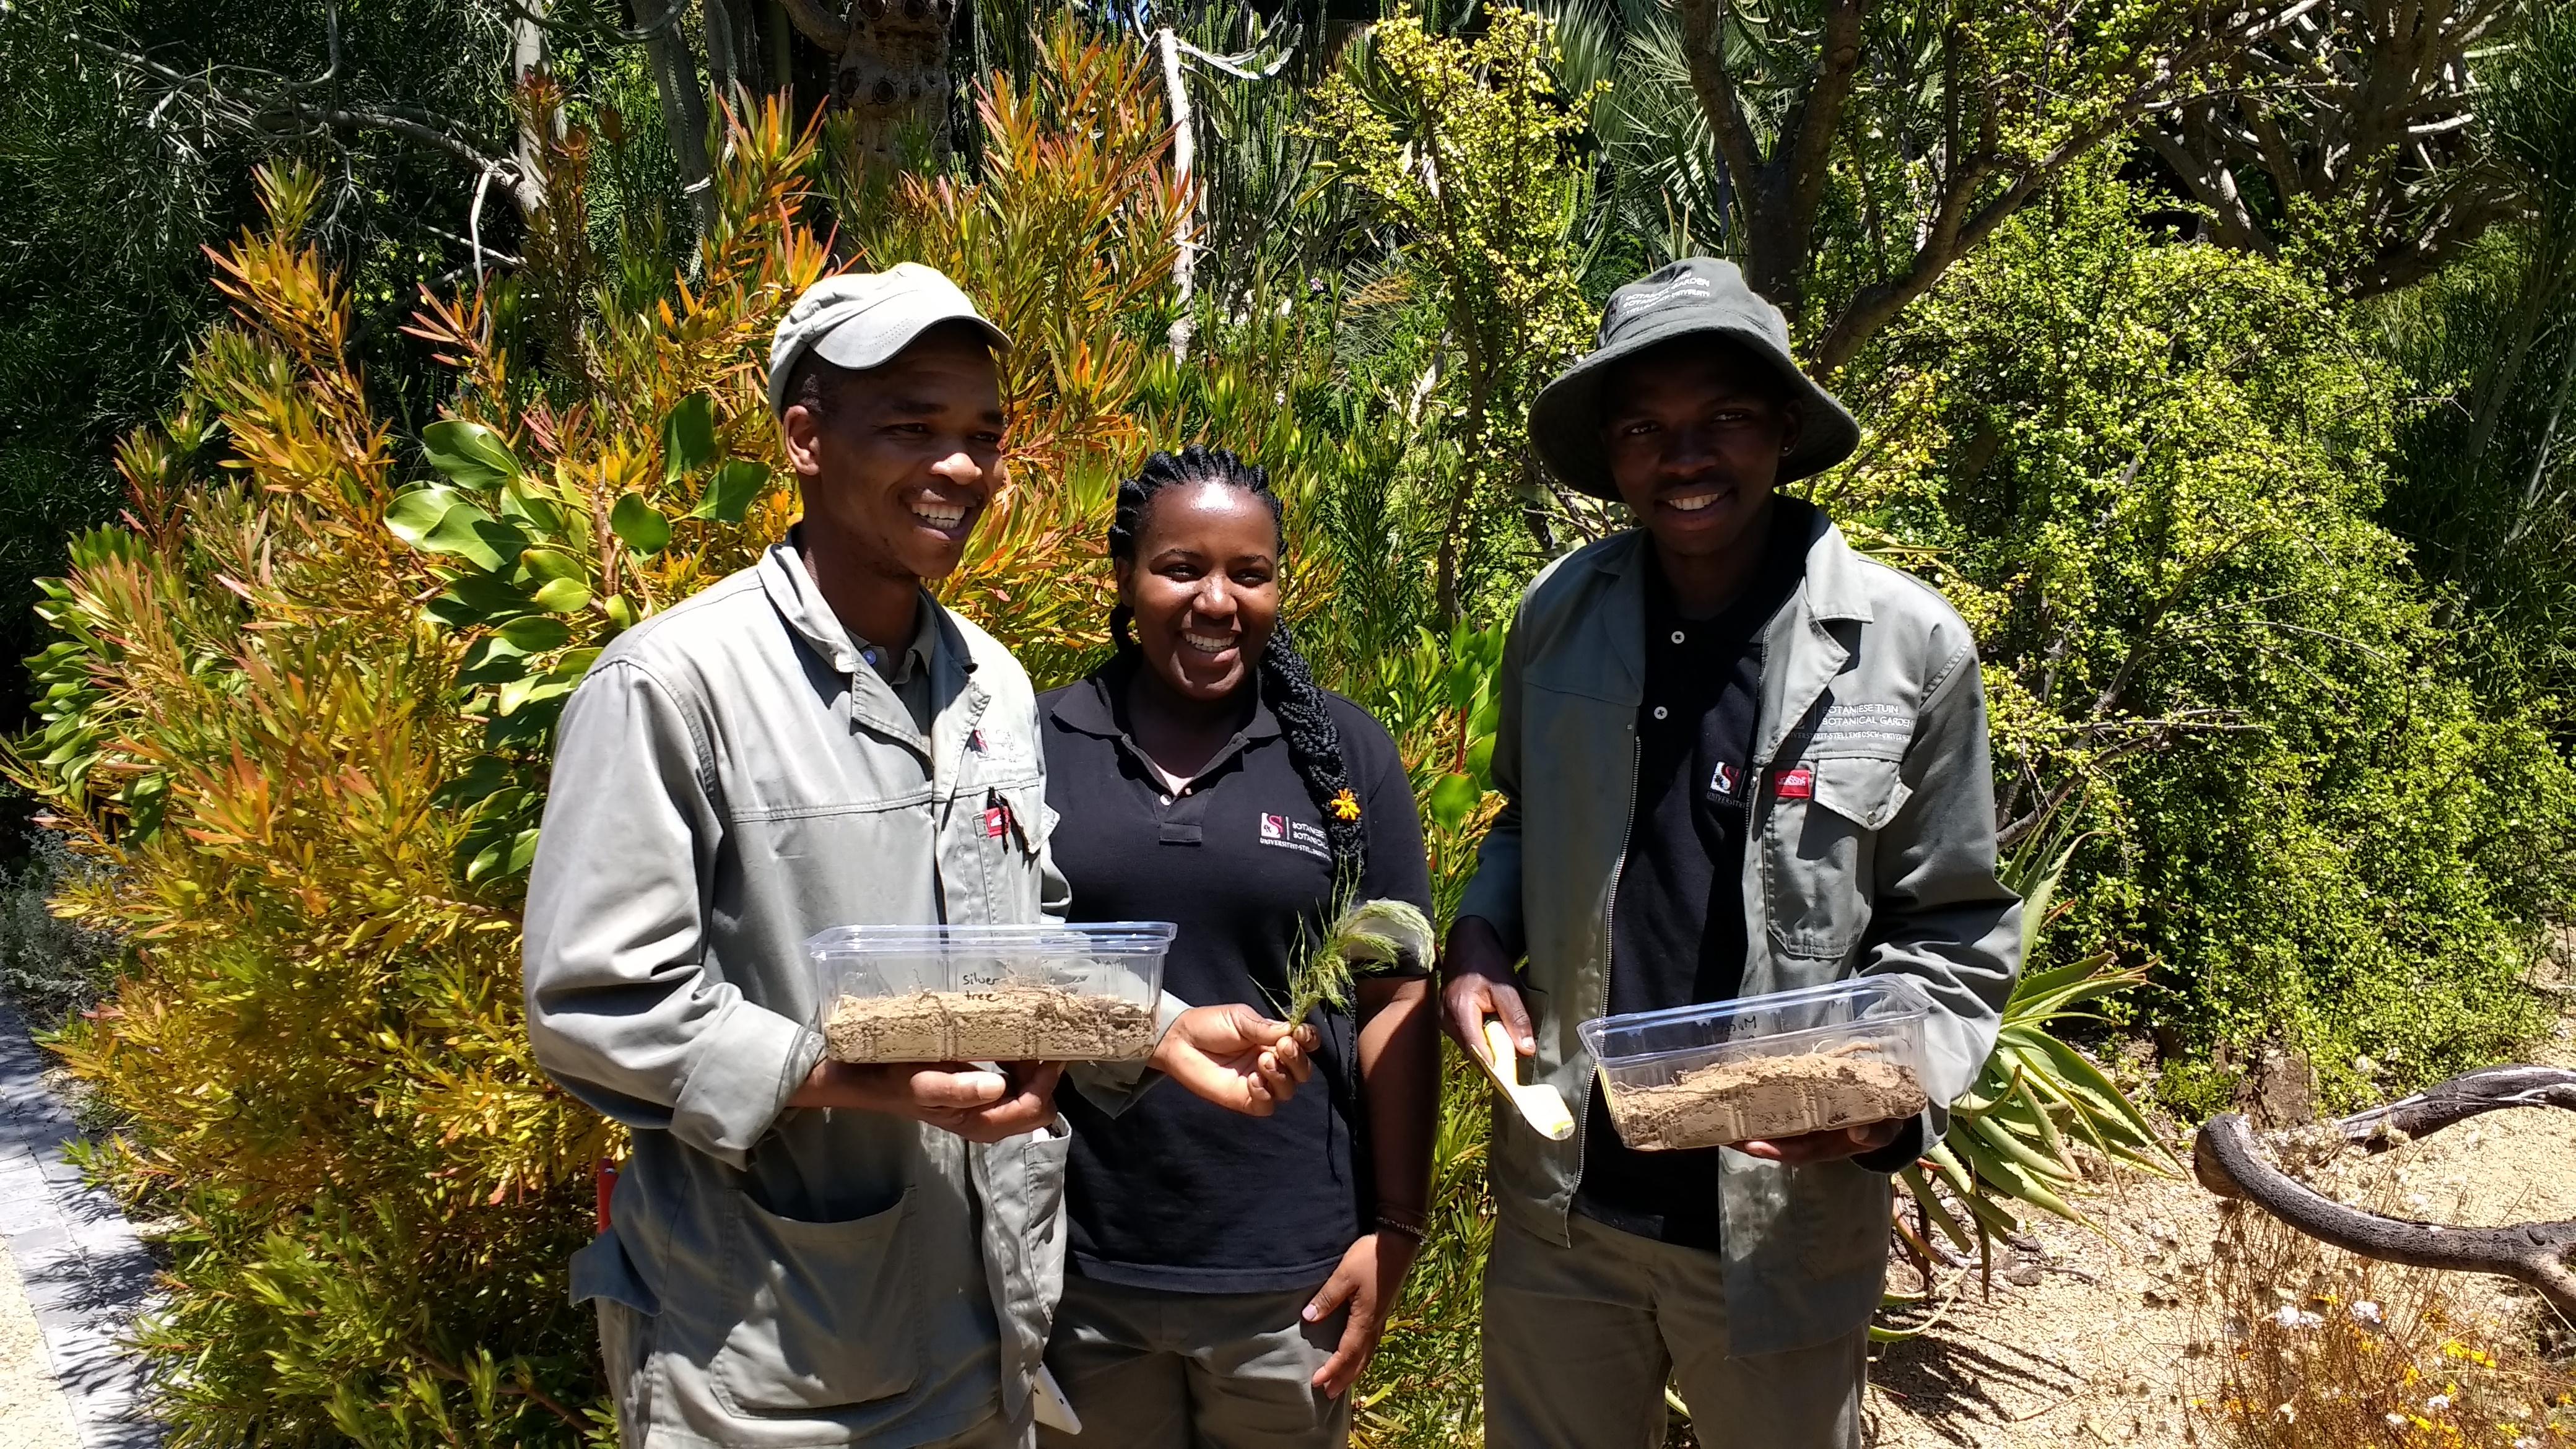 Stellenbosch University Botanical Garden staff